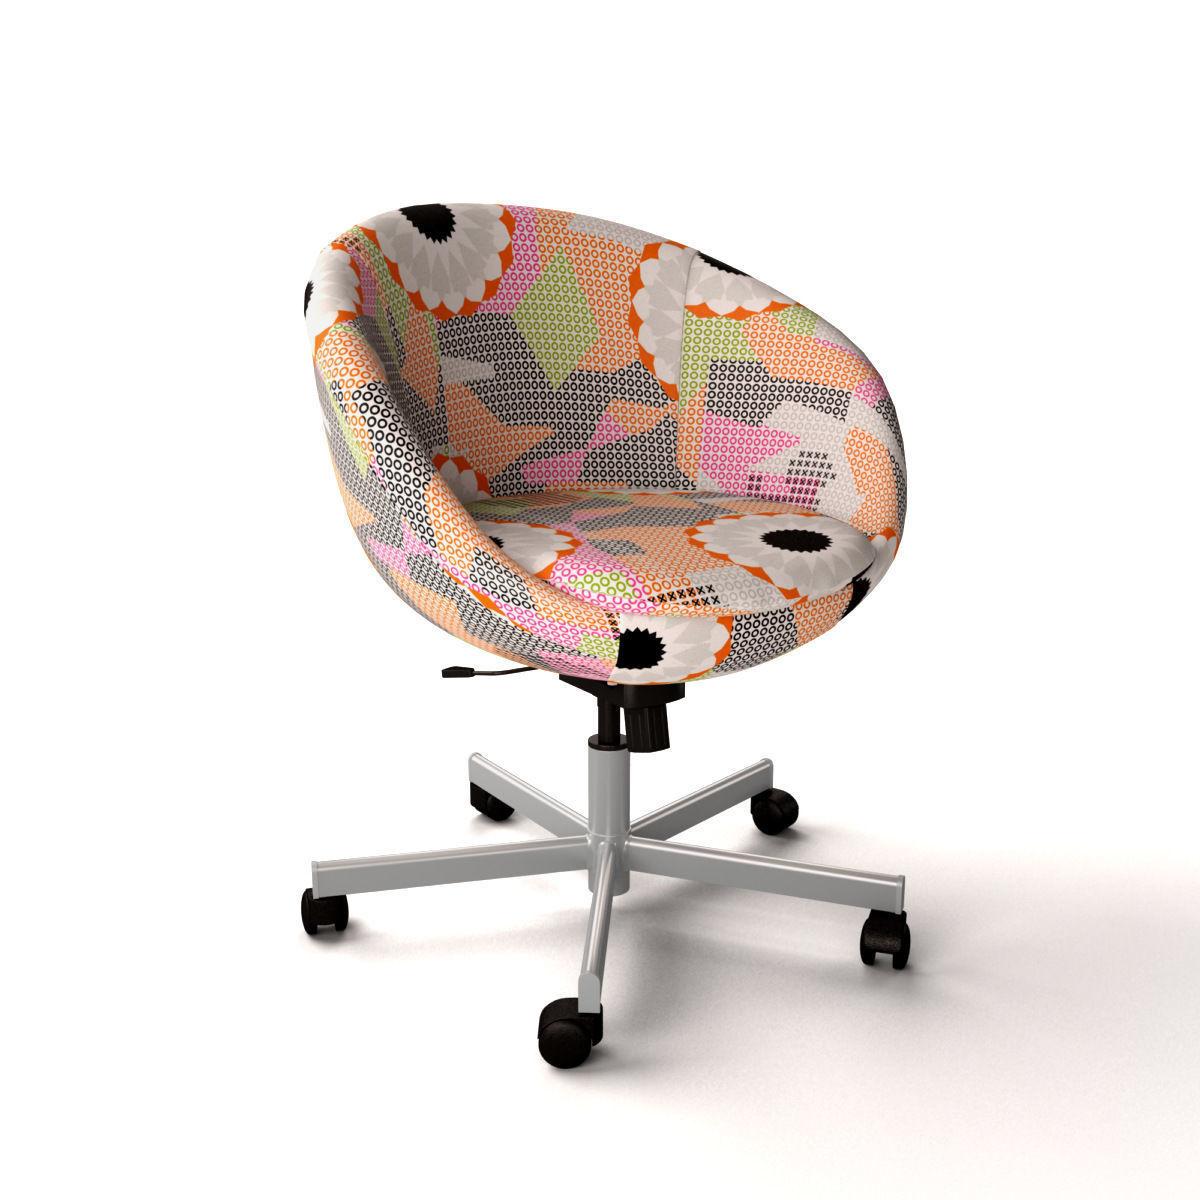 Superieur Ikea Skruvsta Swivel Chair Ankarsvik 3d Model Max Obj 3ds Fbx 1 ...